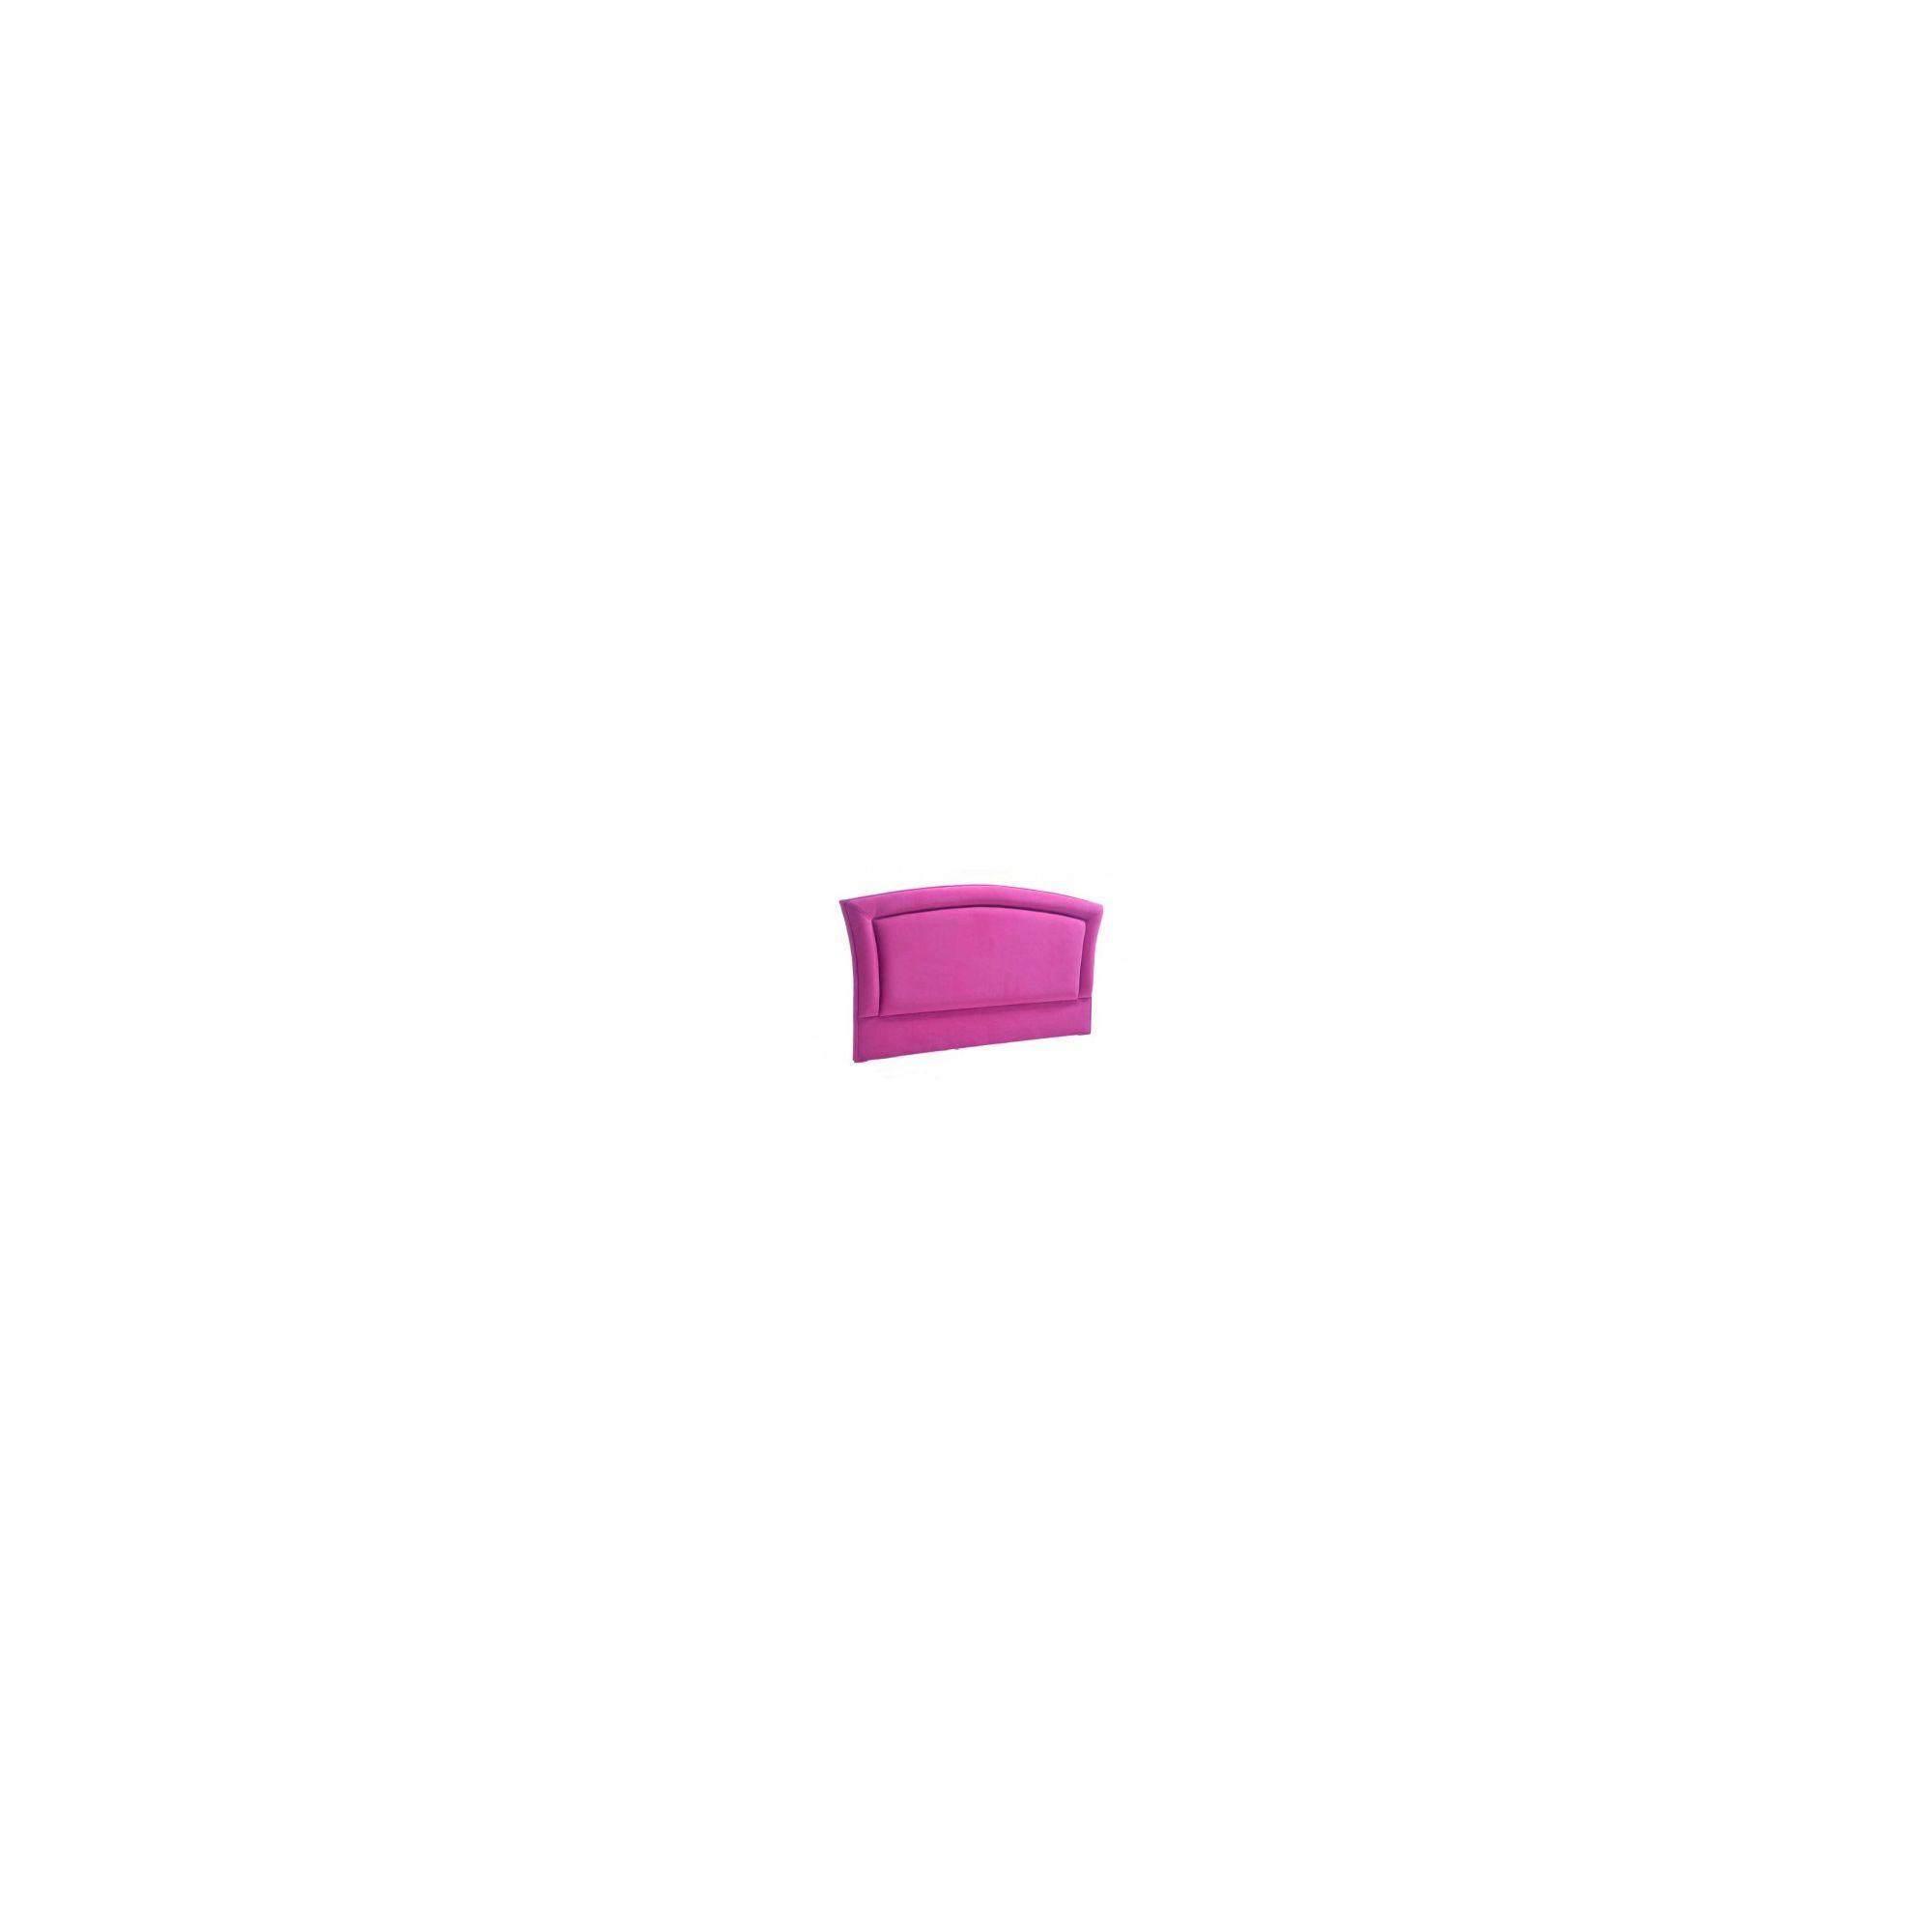 PC Upholstery Dublin Headboard - Cerise - 3' Single at Tescos Direct